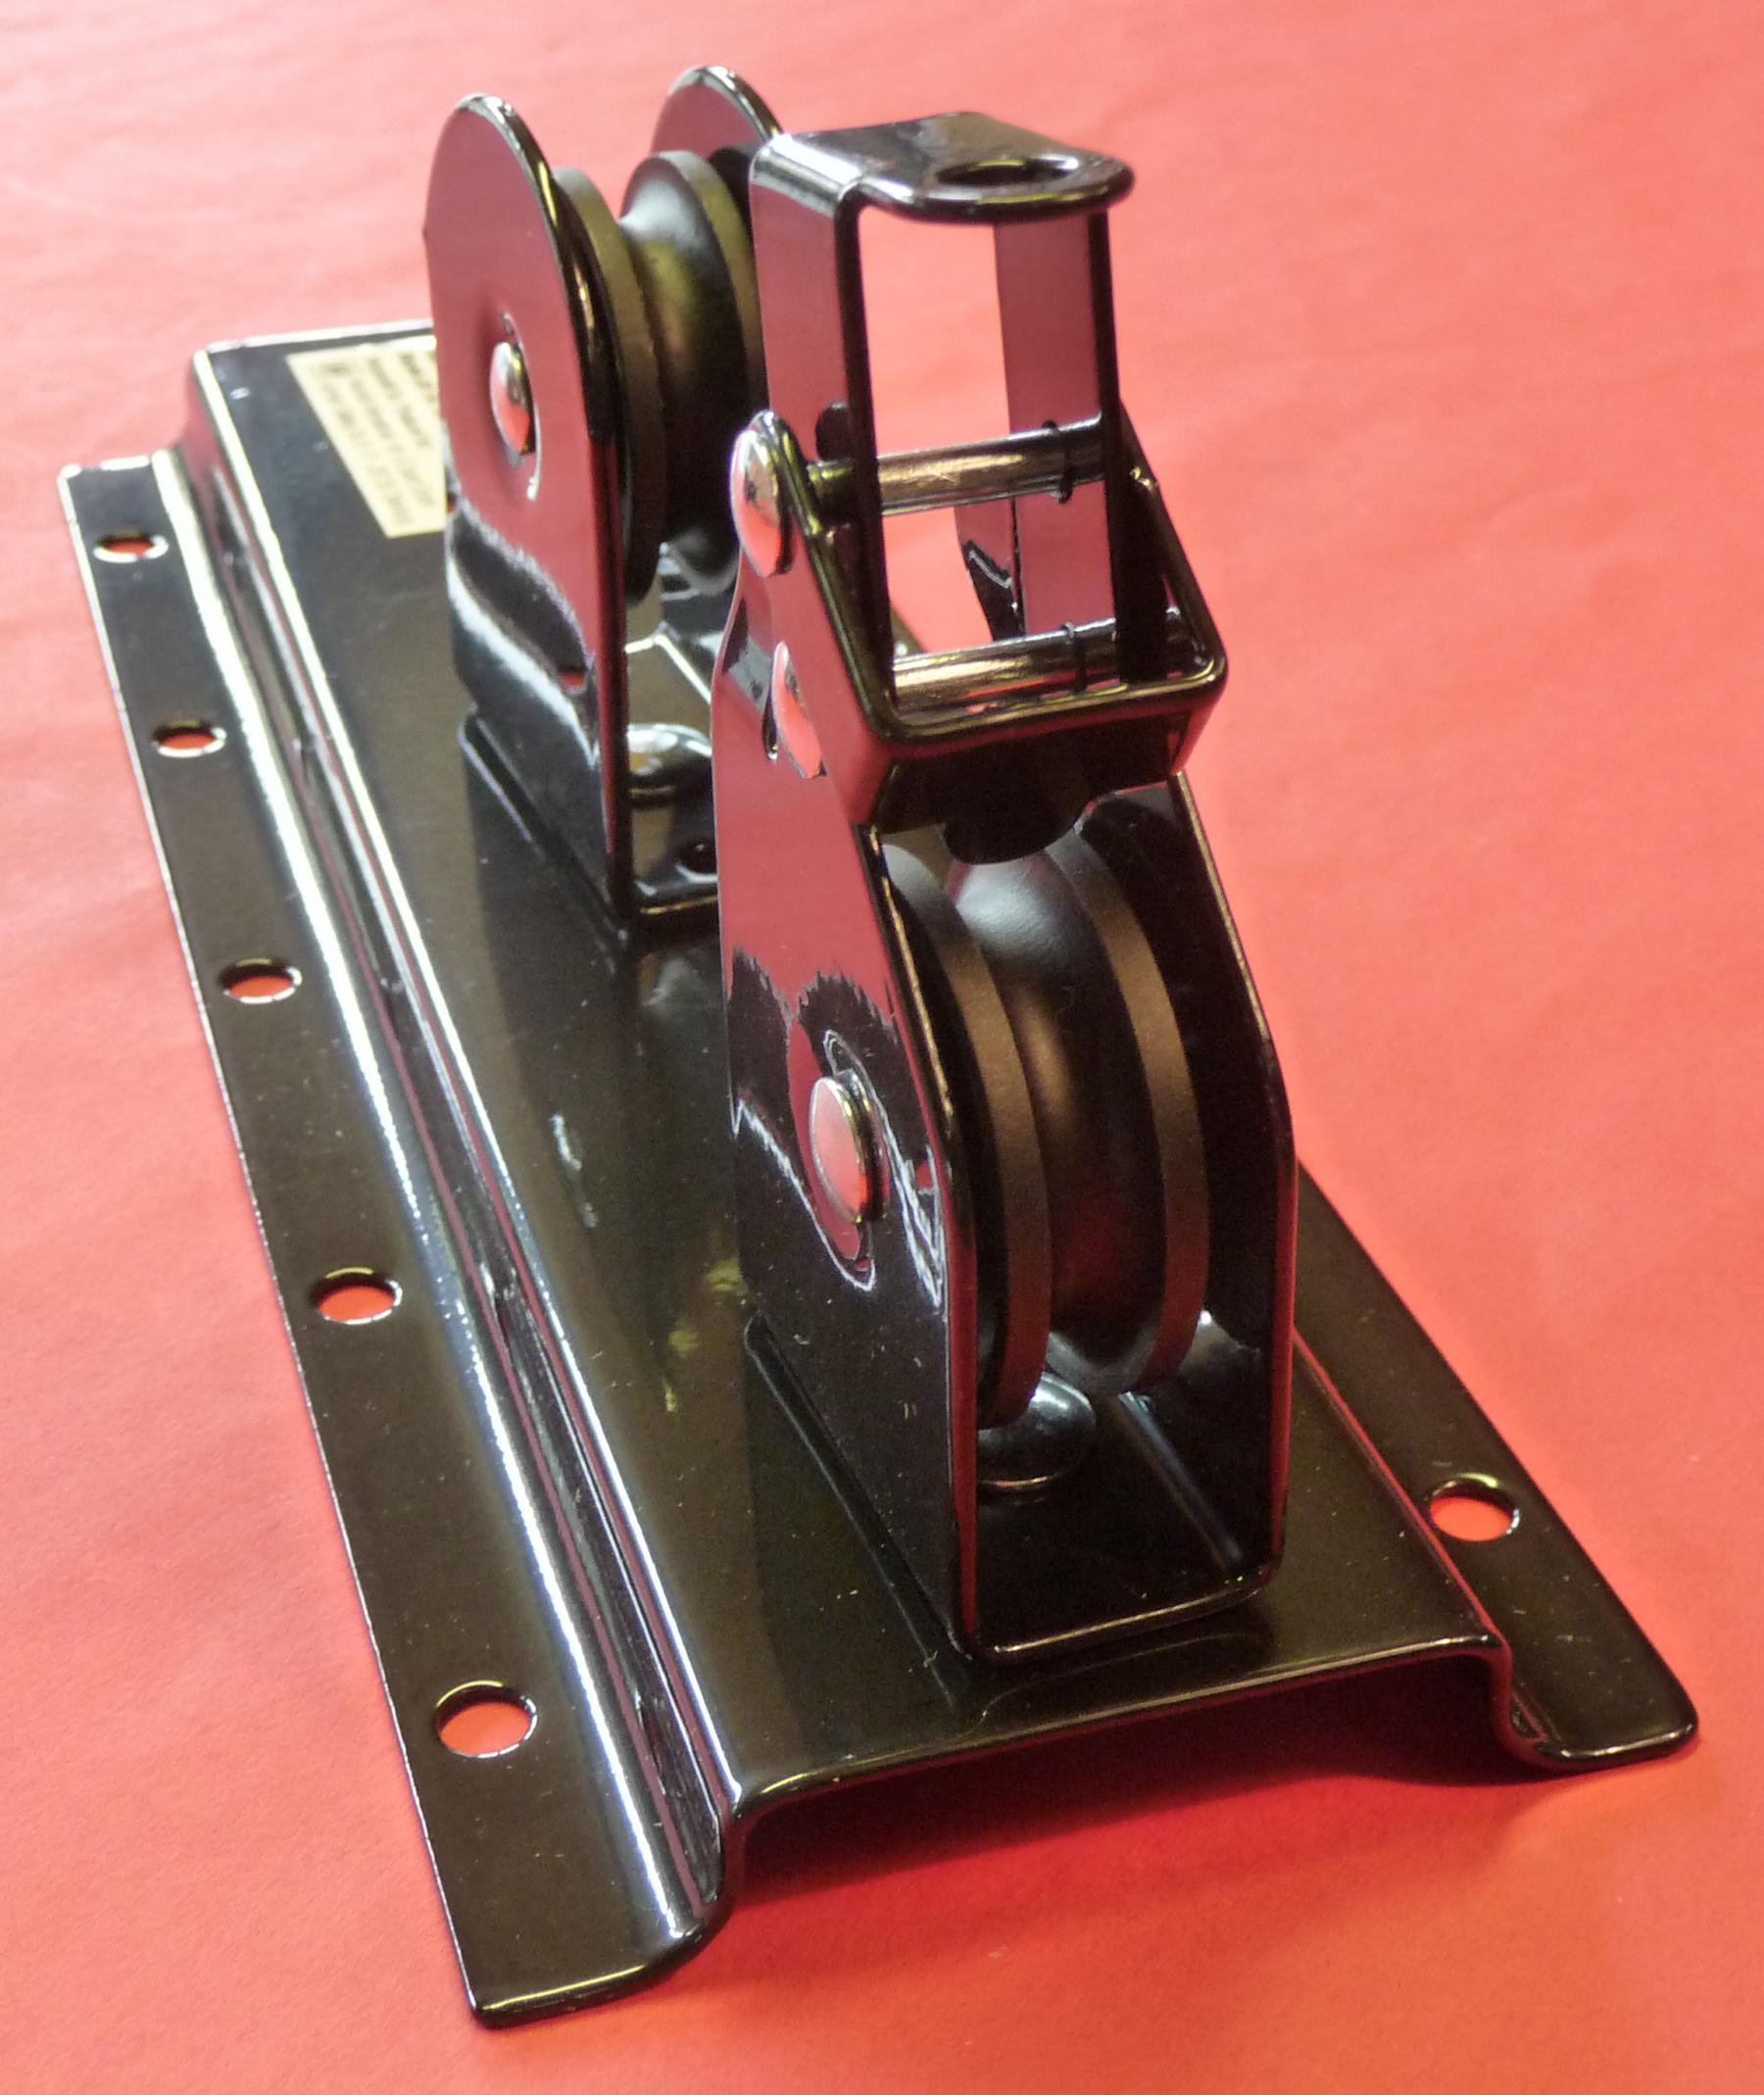 Fahrrad Lift Deckenhalter Bis 20 Kg In Top Qualitat